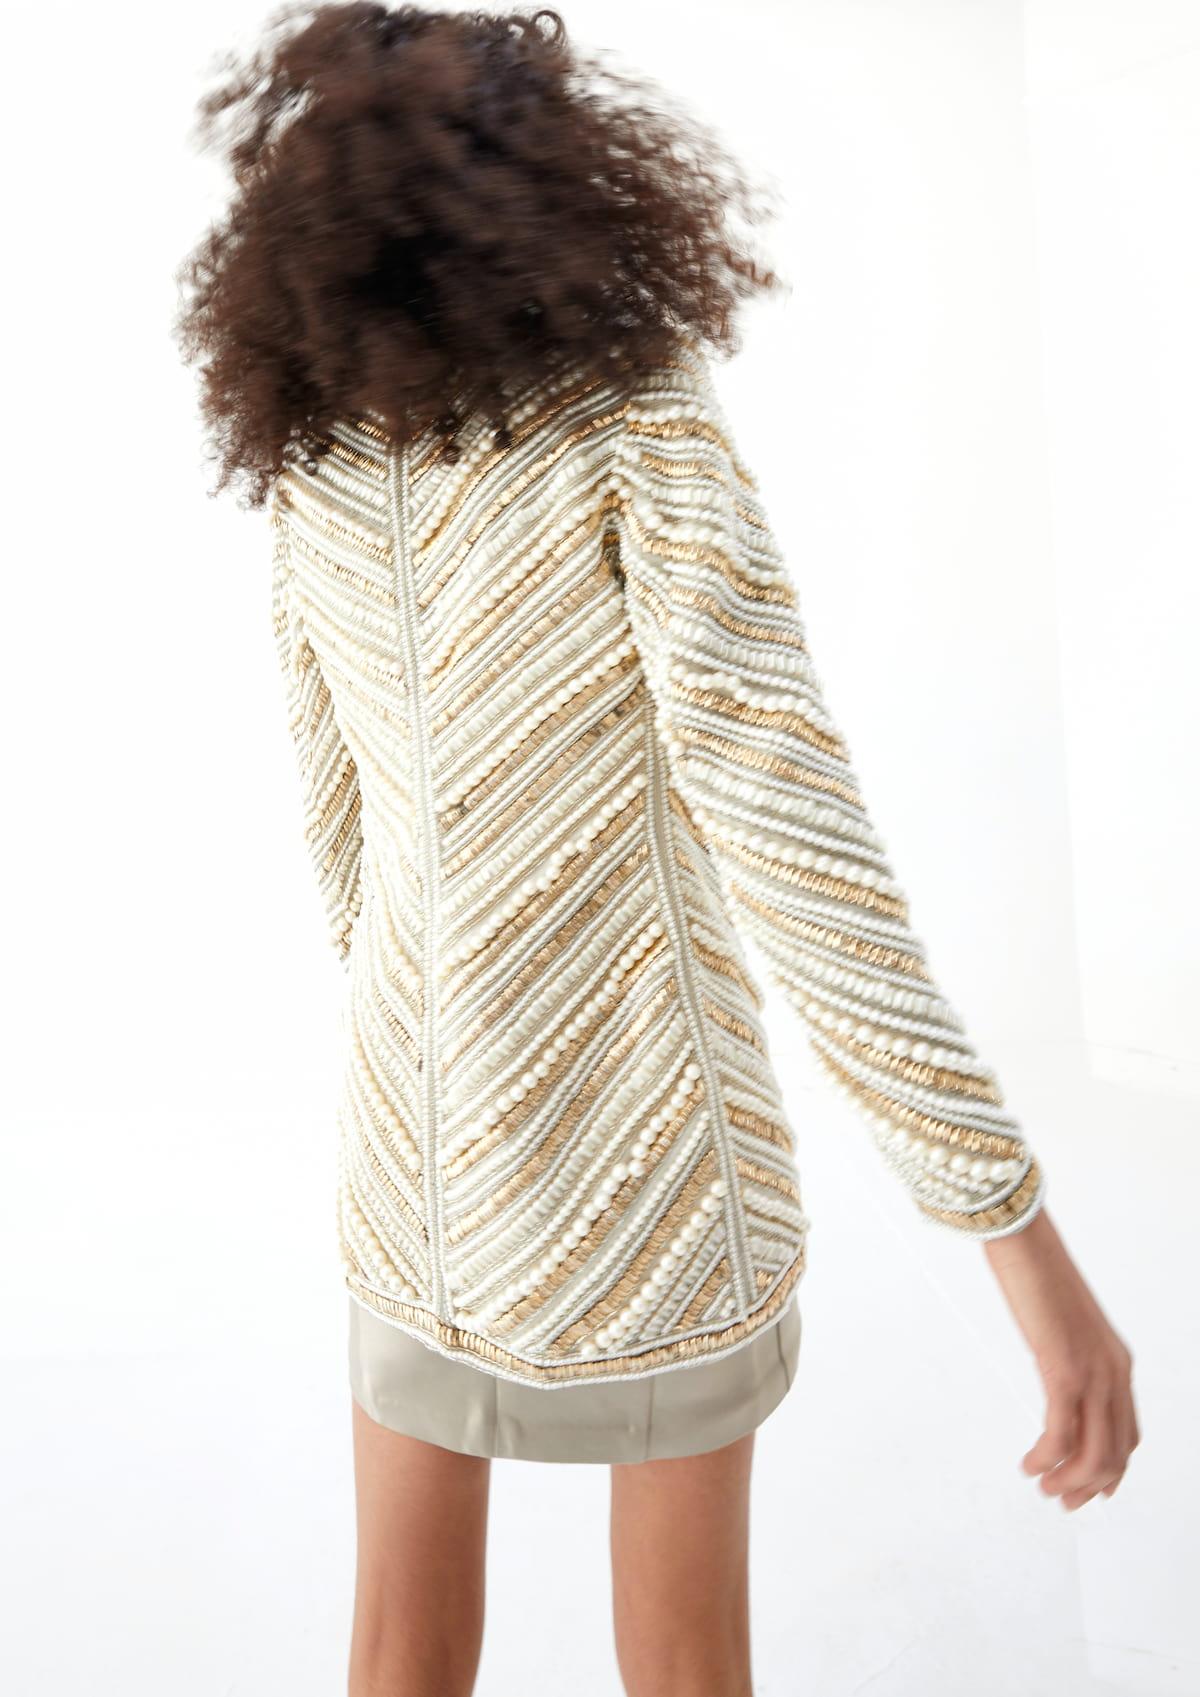 View 3 of model wearing Kasira Blazer in pearl gold.